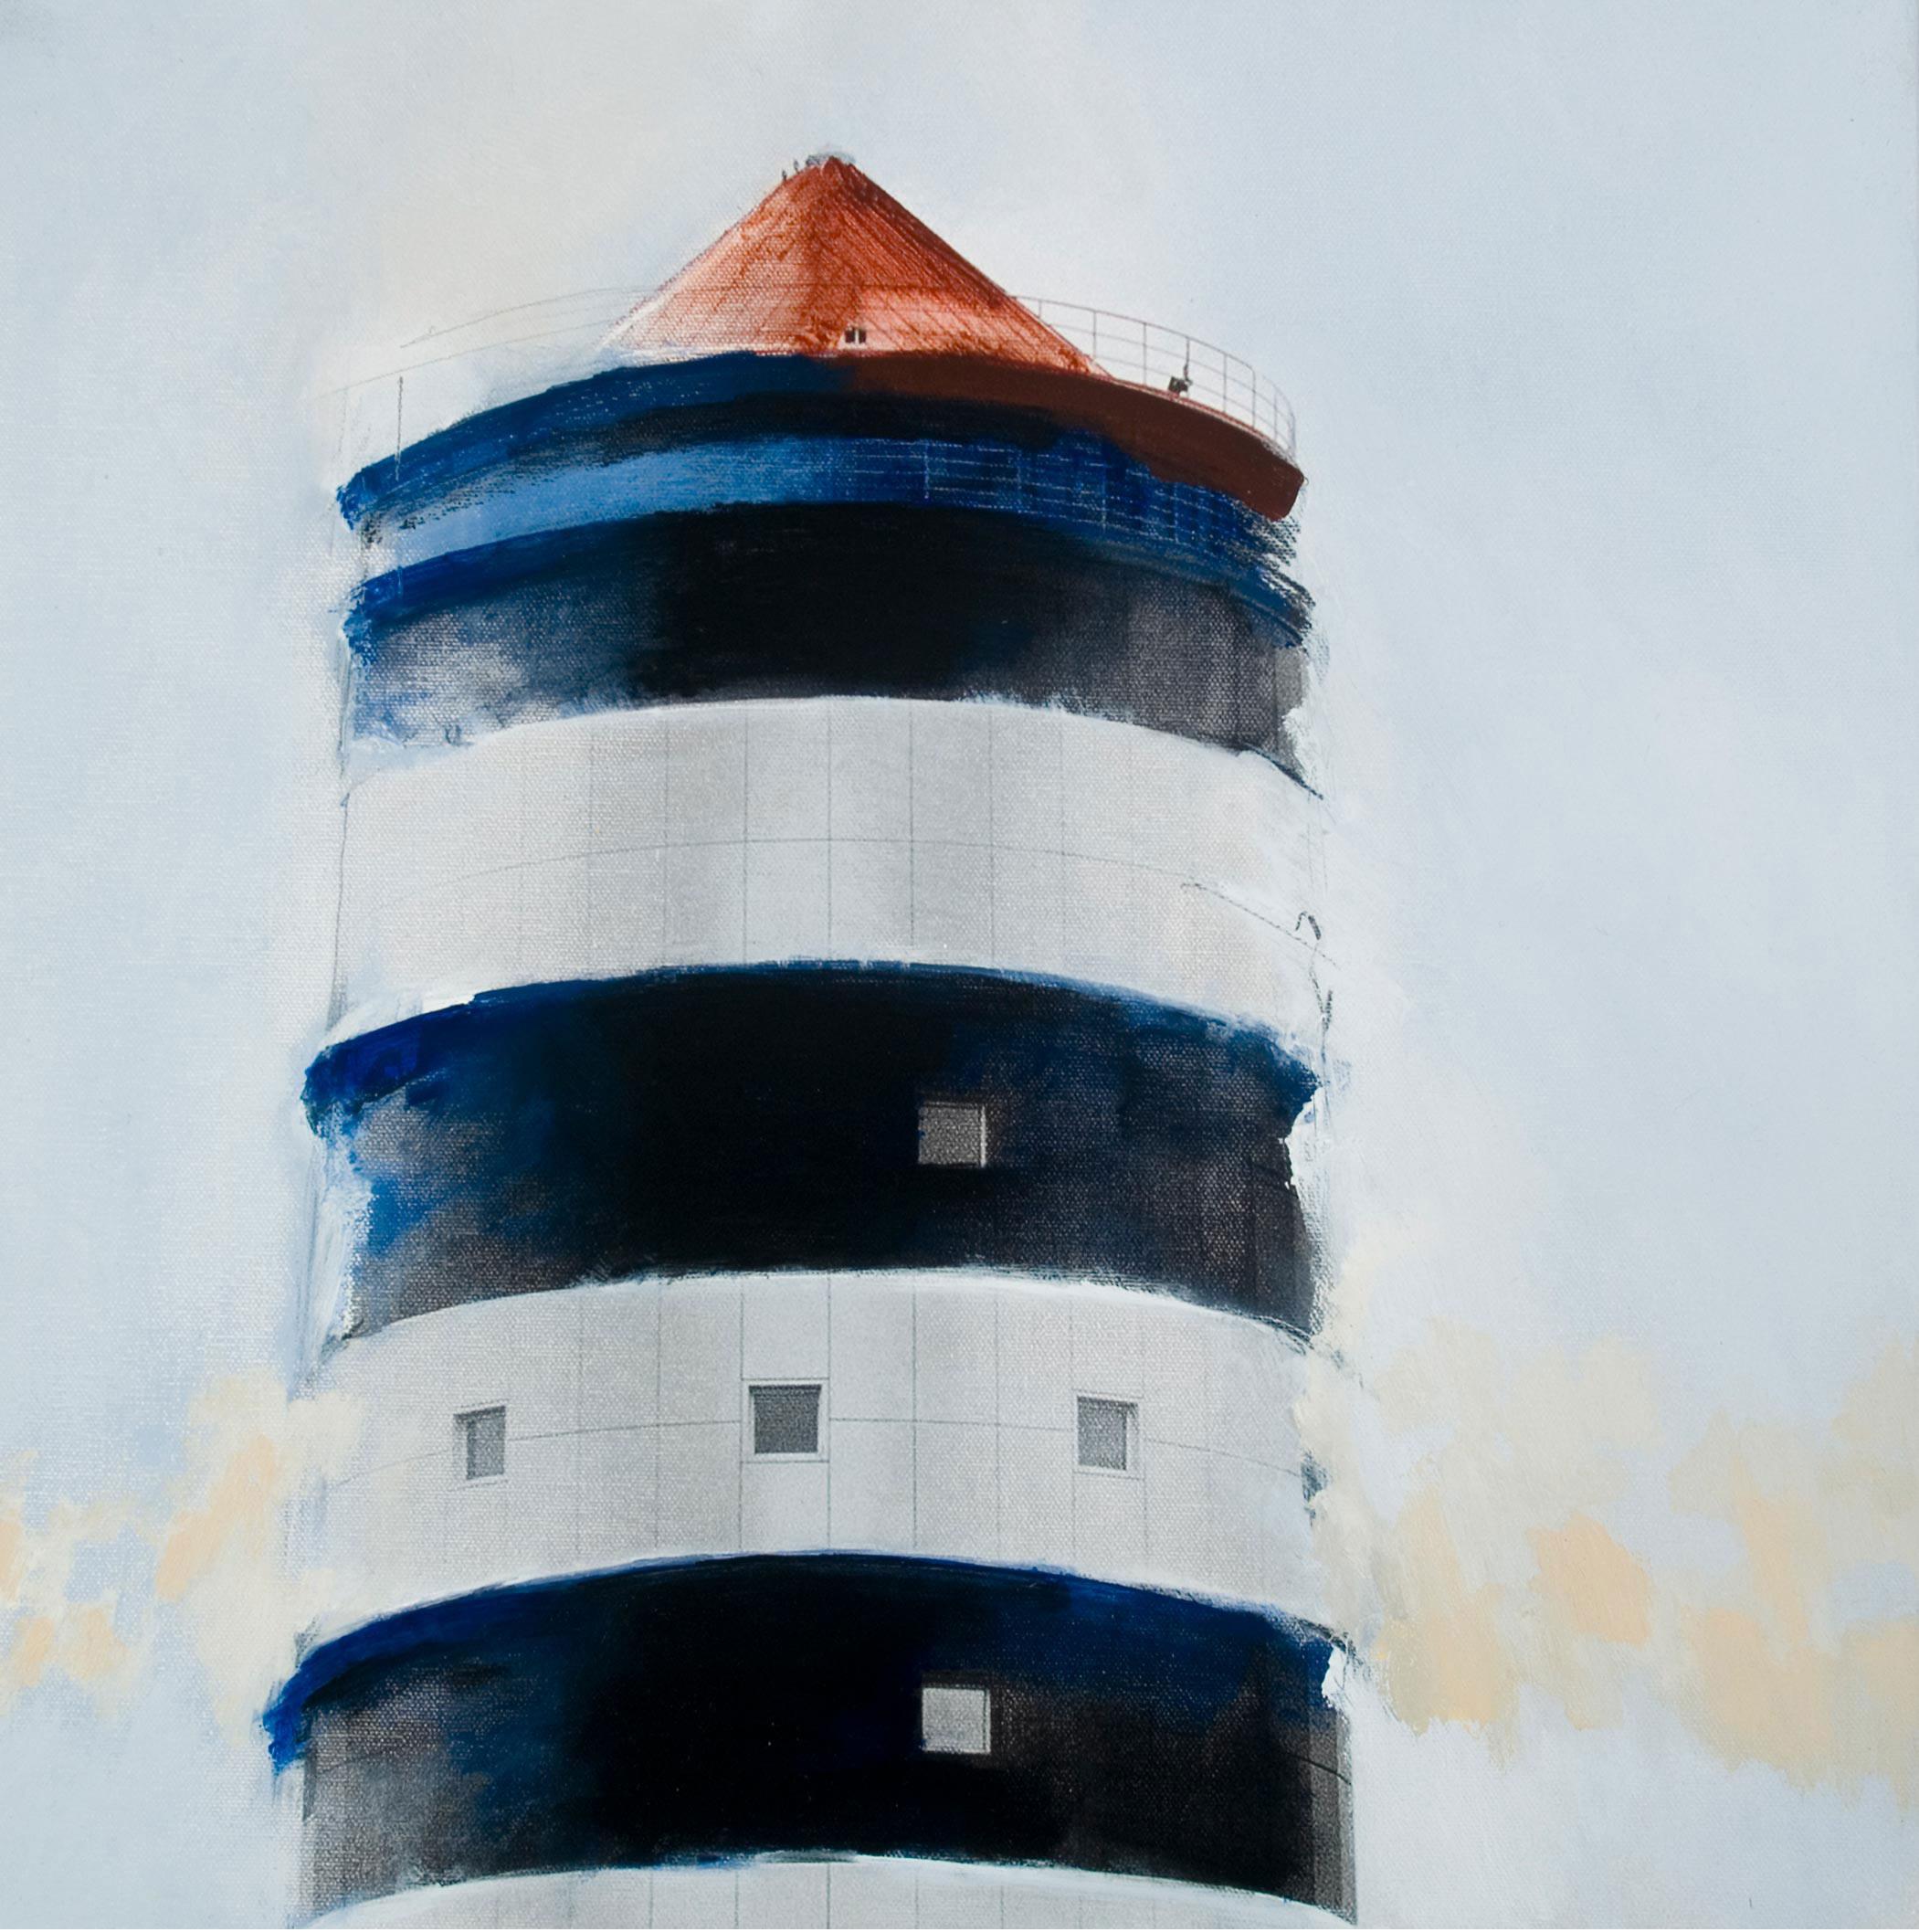 Faros, torres y chimeneas VI